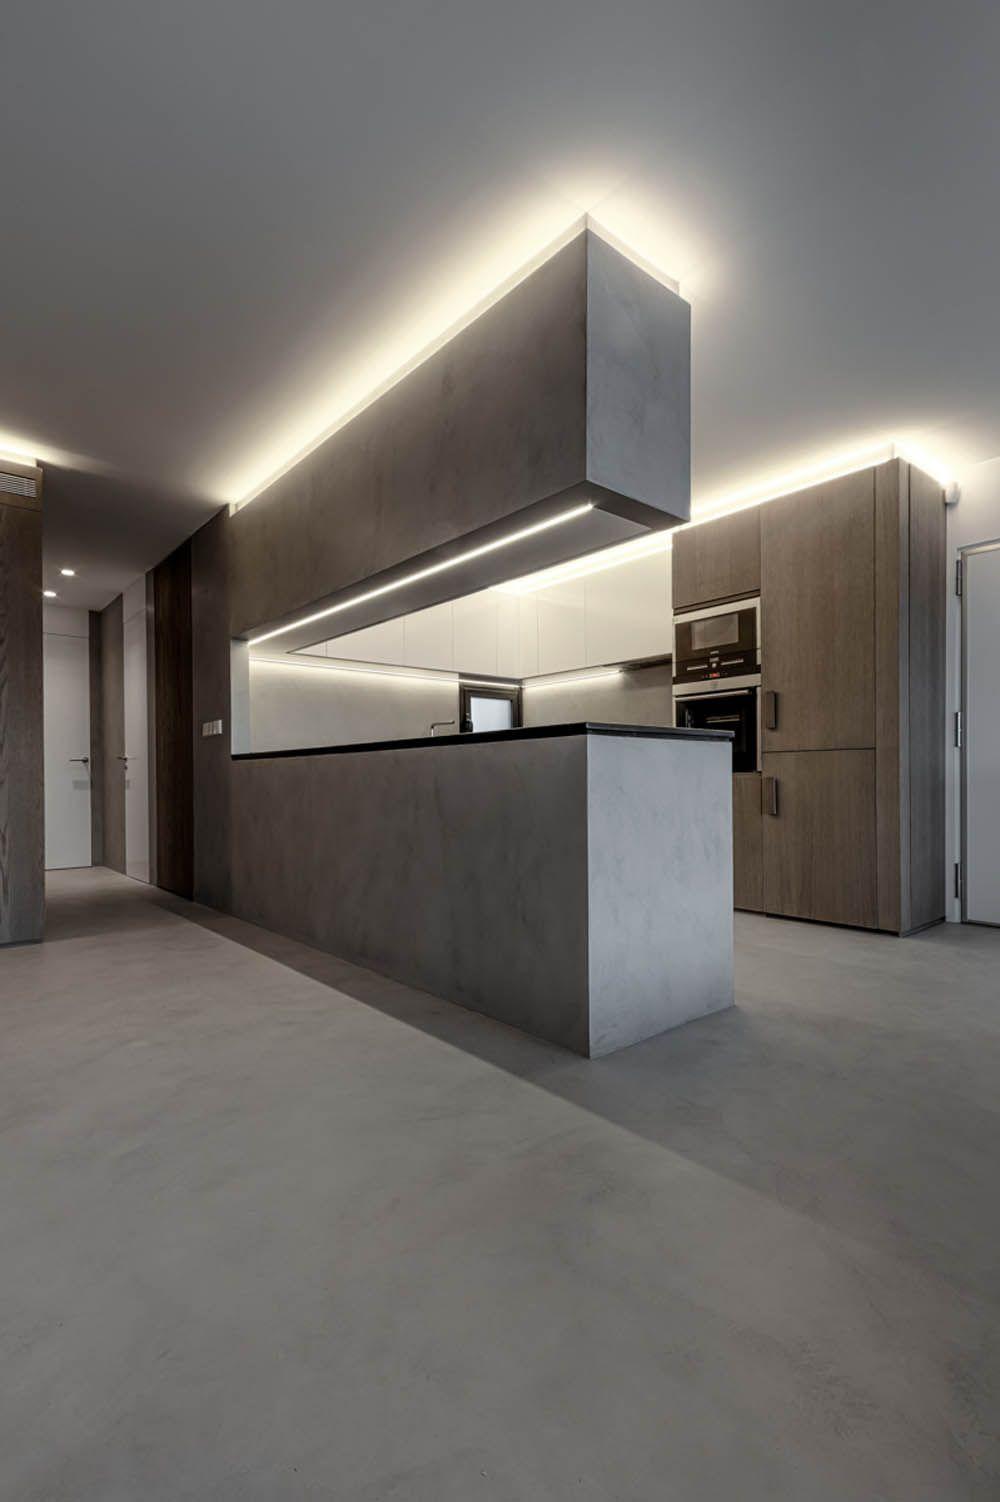 Ideas de decoraci n e iluminaci n con tiras de leds - Iluminacion cocina led ...